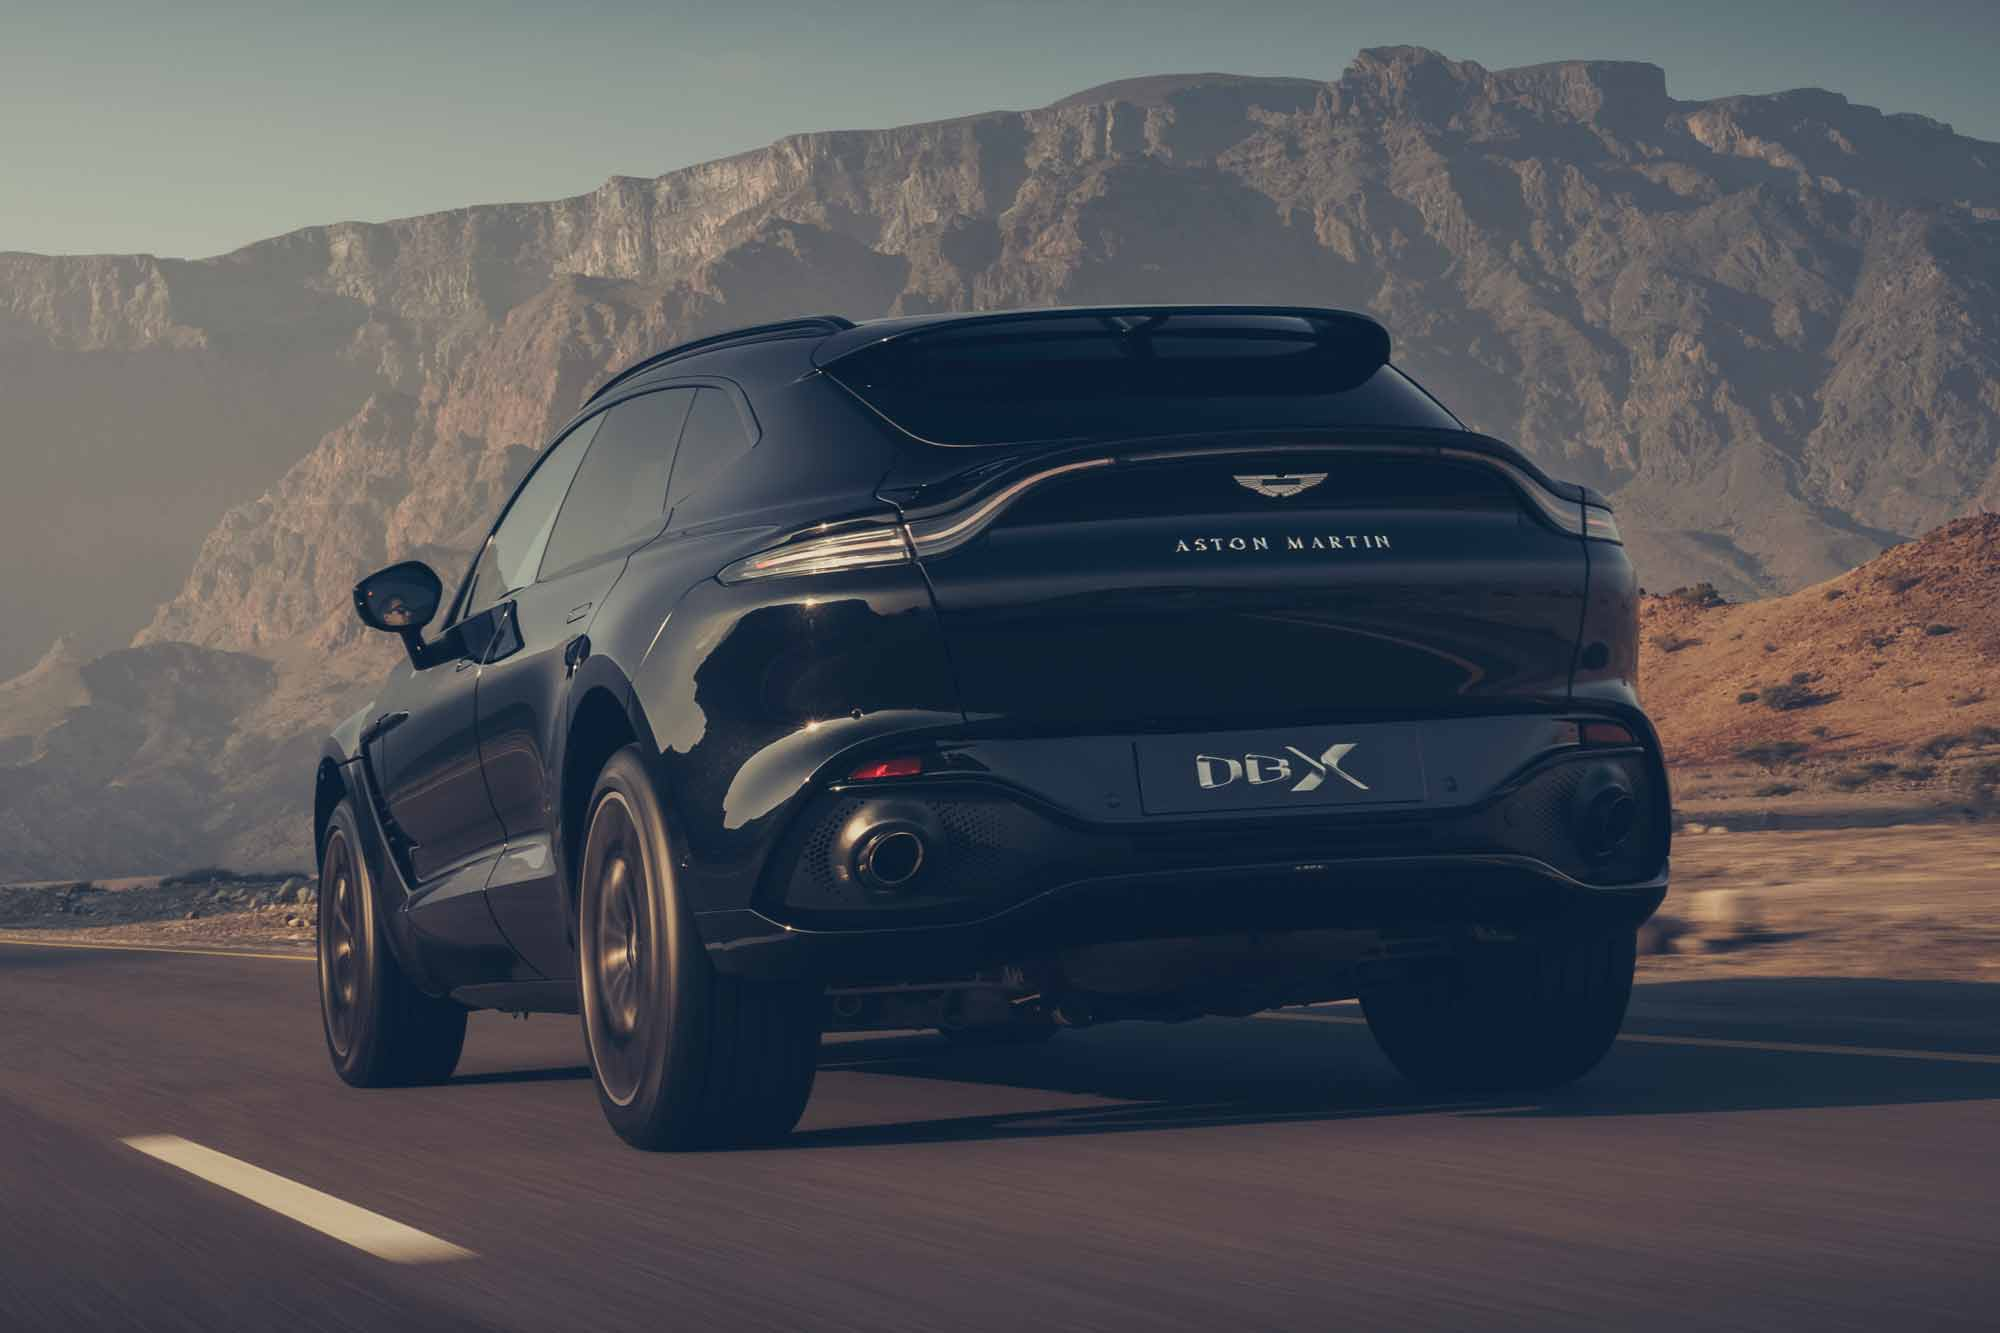 Retro Aston Martin DBX